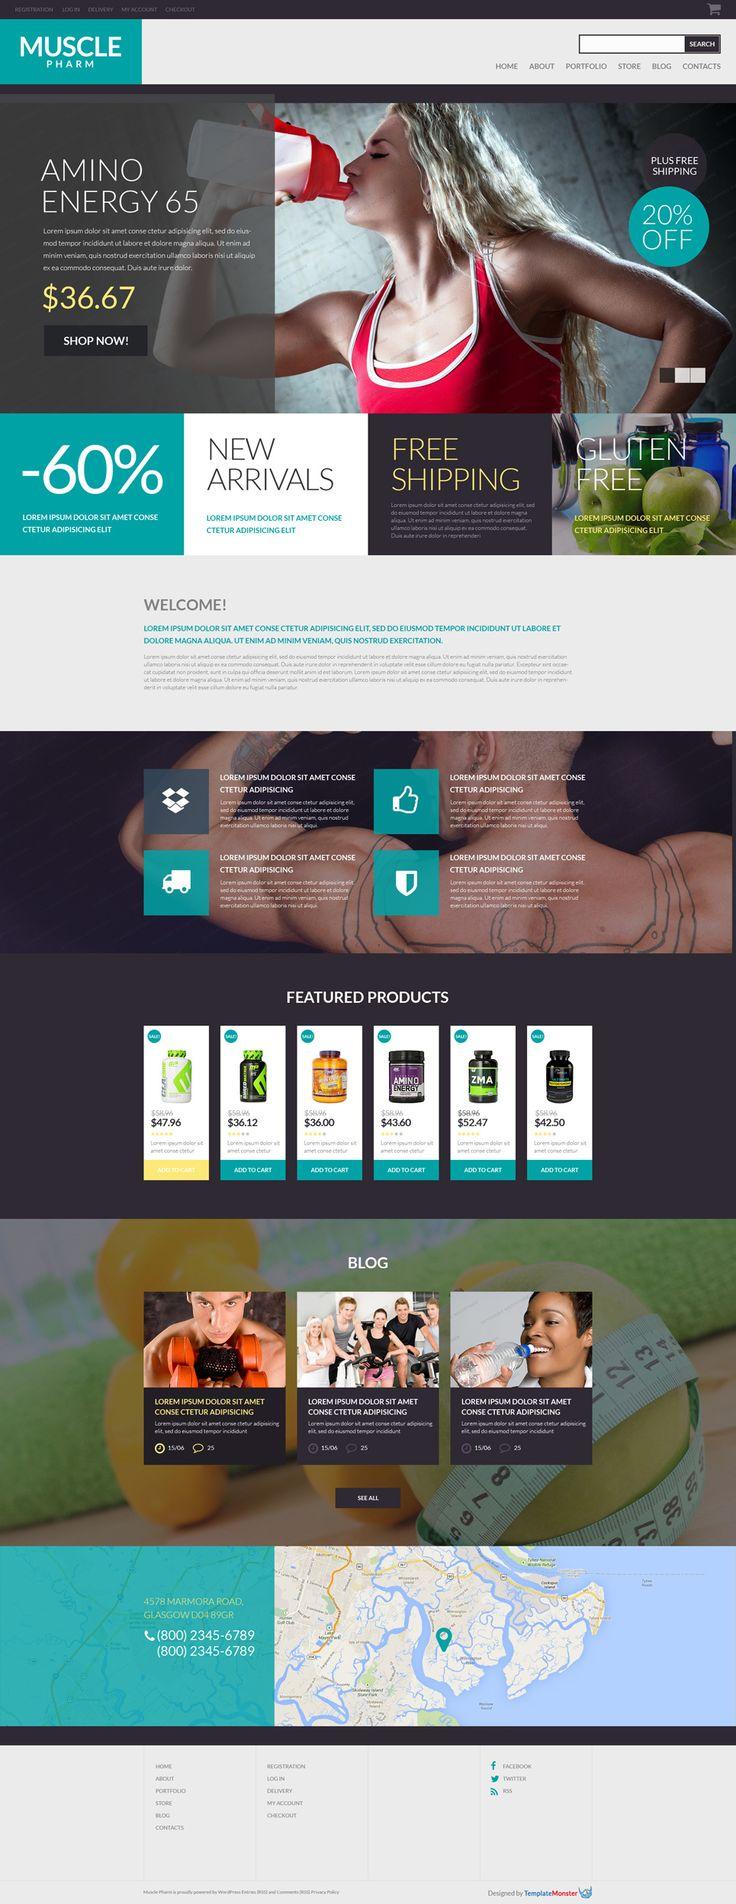 Free WooCommerce Theme for Drug Store #template #website http://www.templatemonster.com/free-woocommerce-theme-for-drug-store.html?utm_source=pinterest&utm_medium=timeline&utm_campaign=frwocd